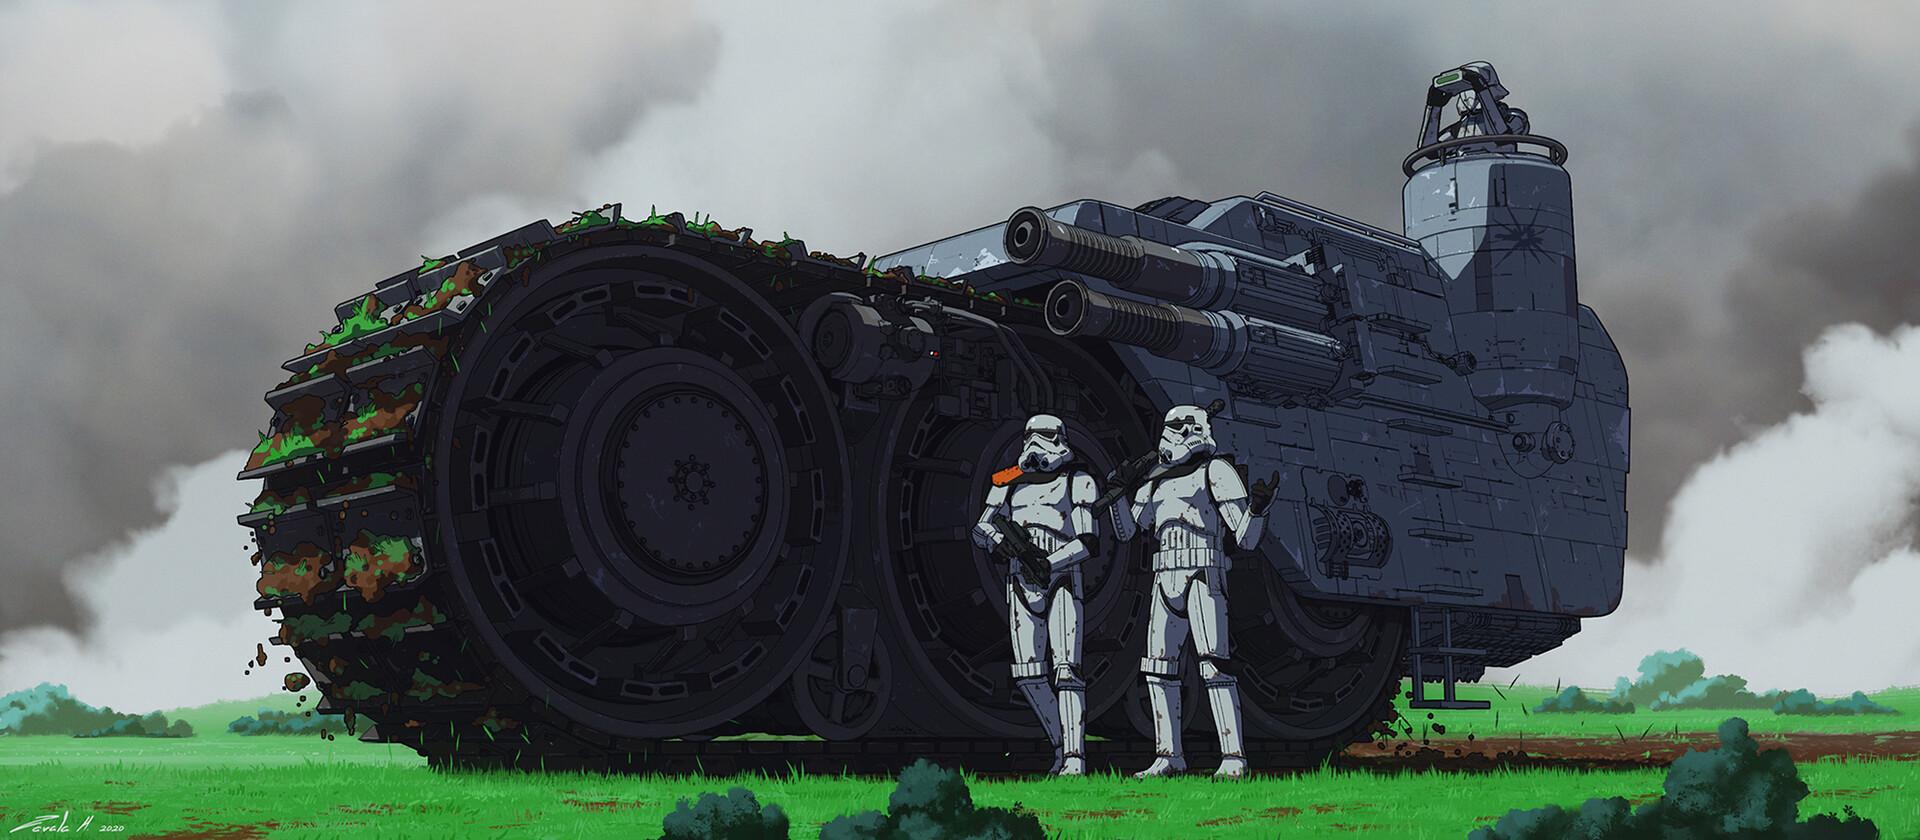 stephen-zavala-imperial-crawler-1-sz.jpg